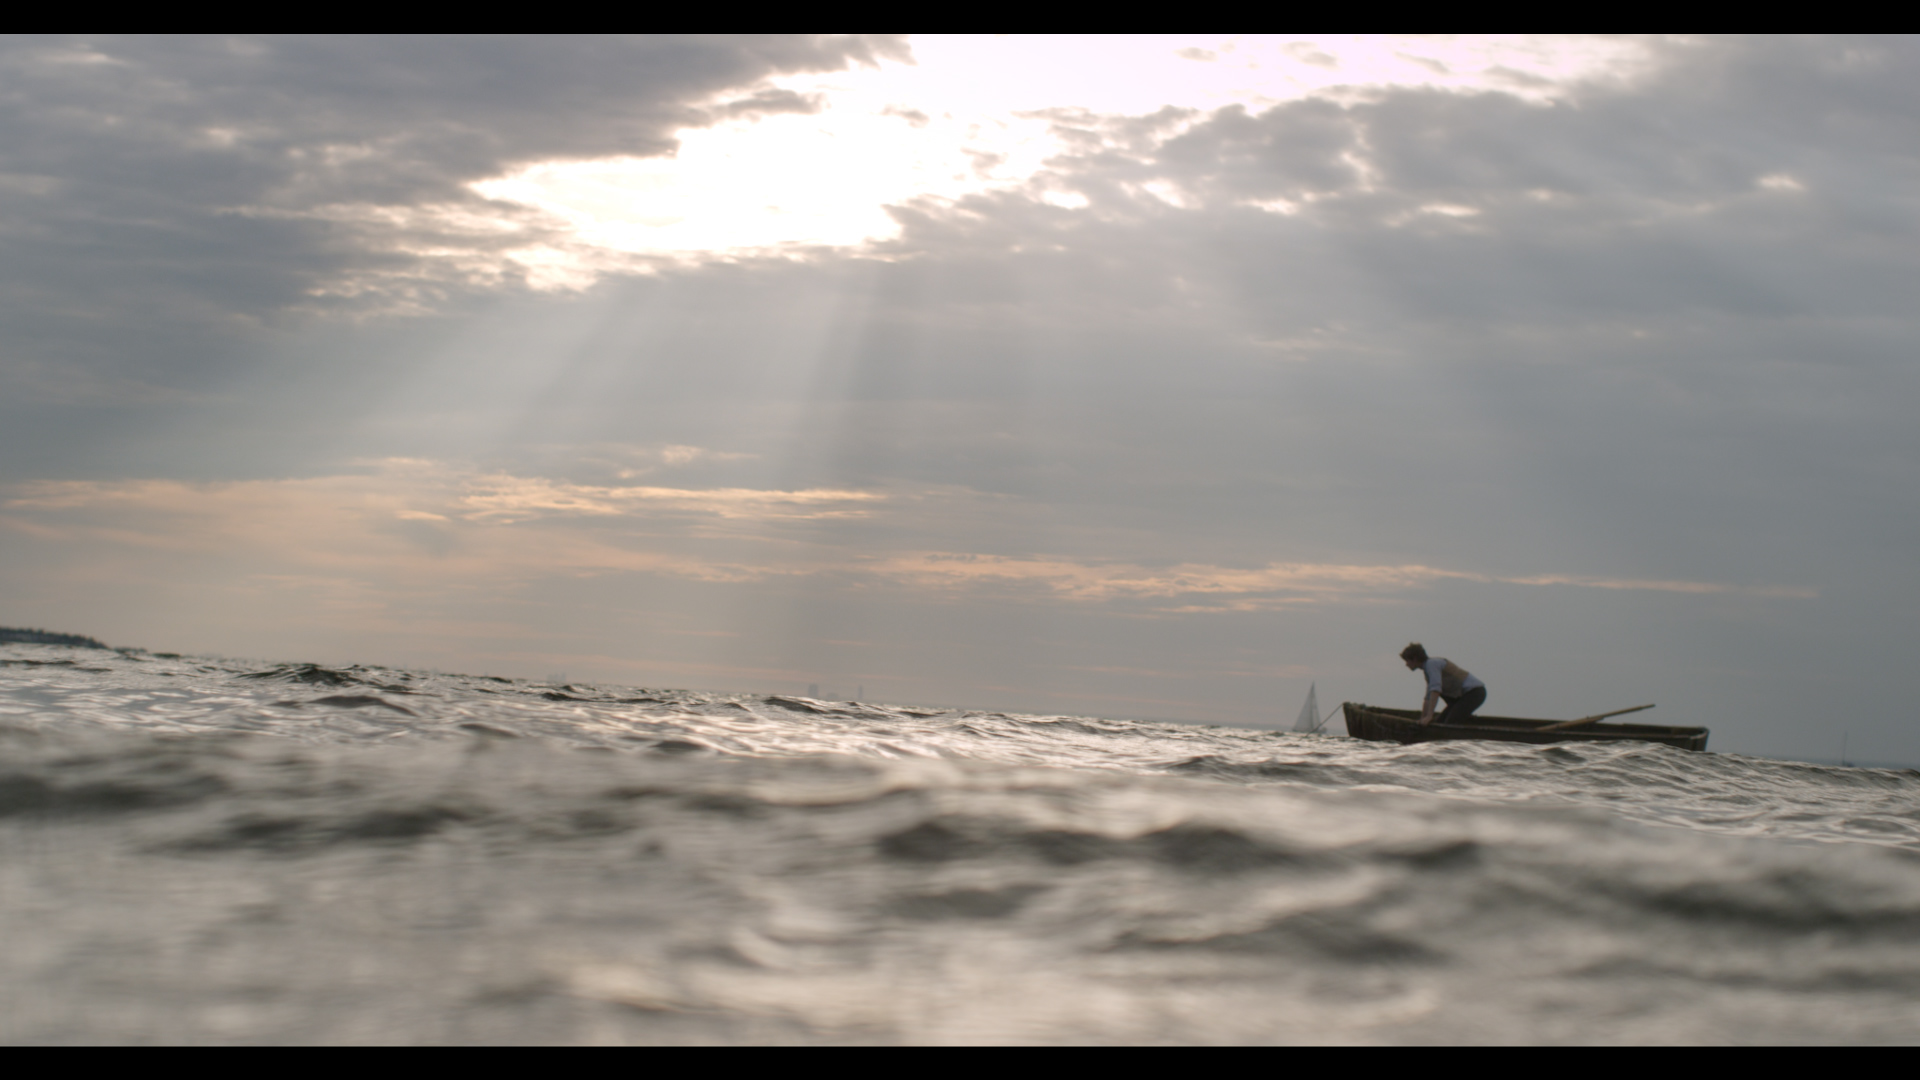 Fisherman_7.jpg